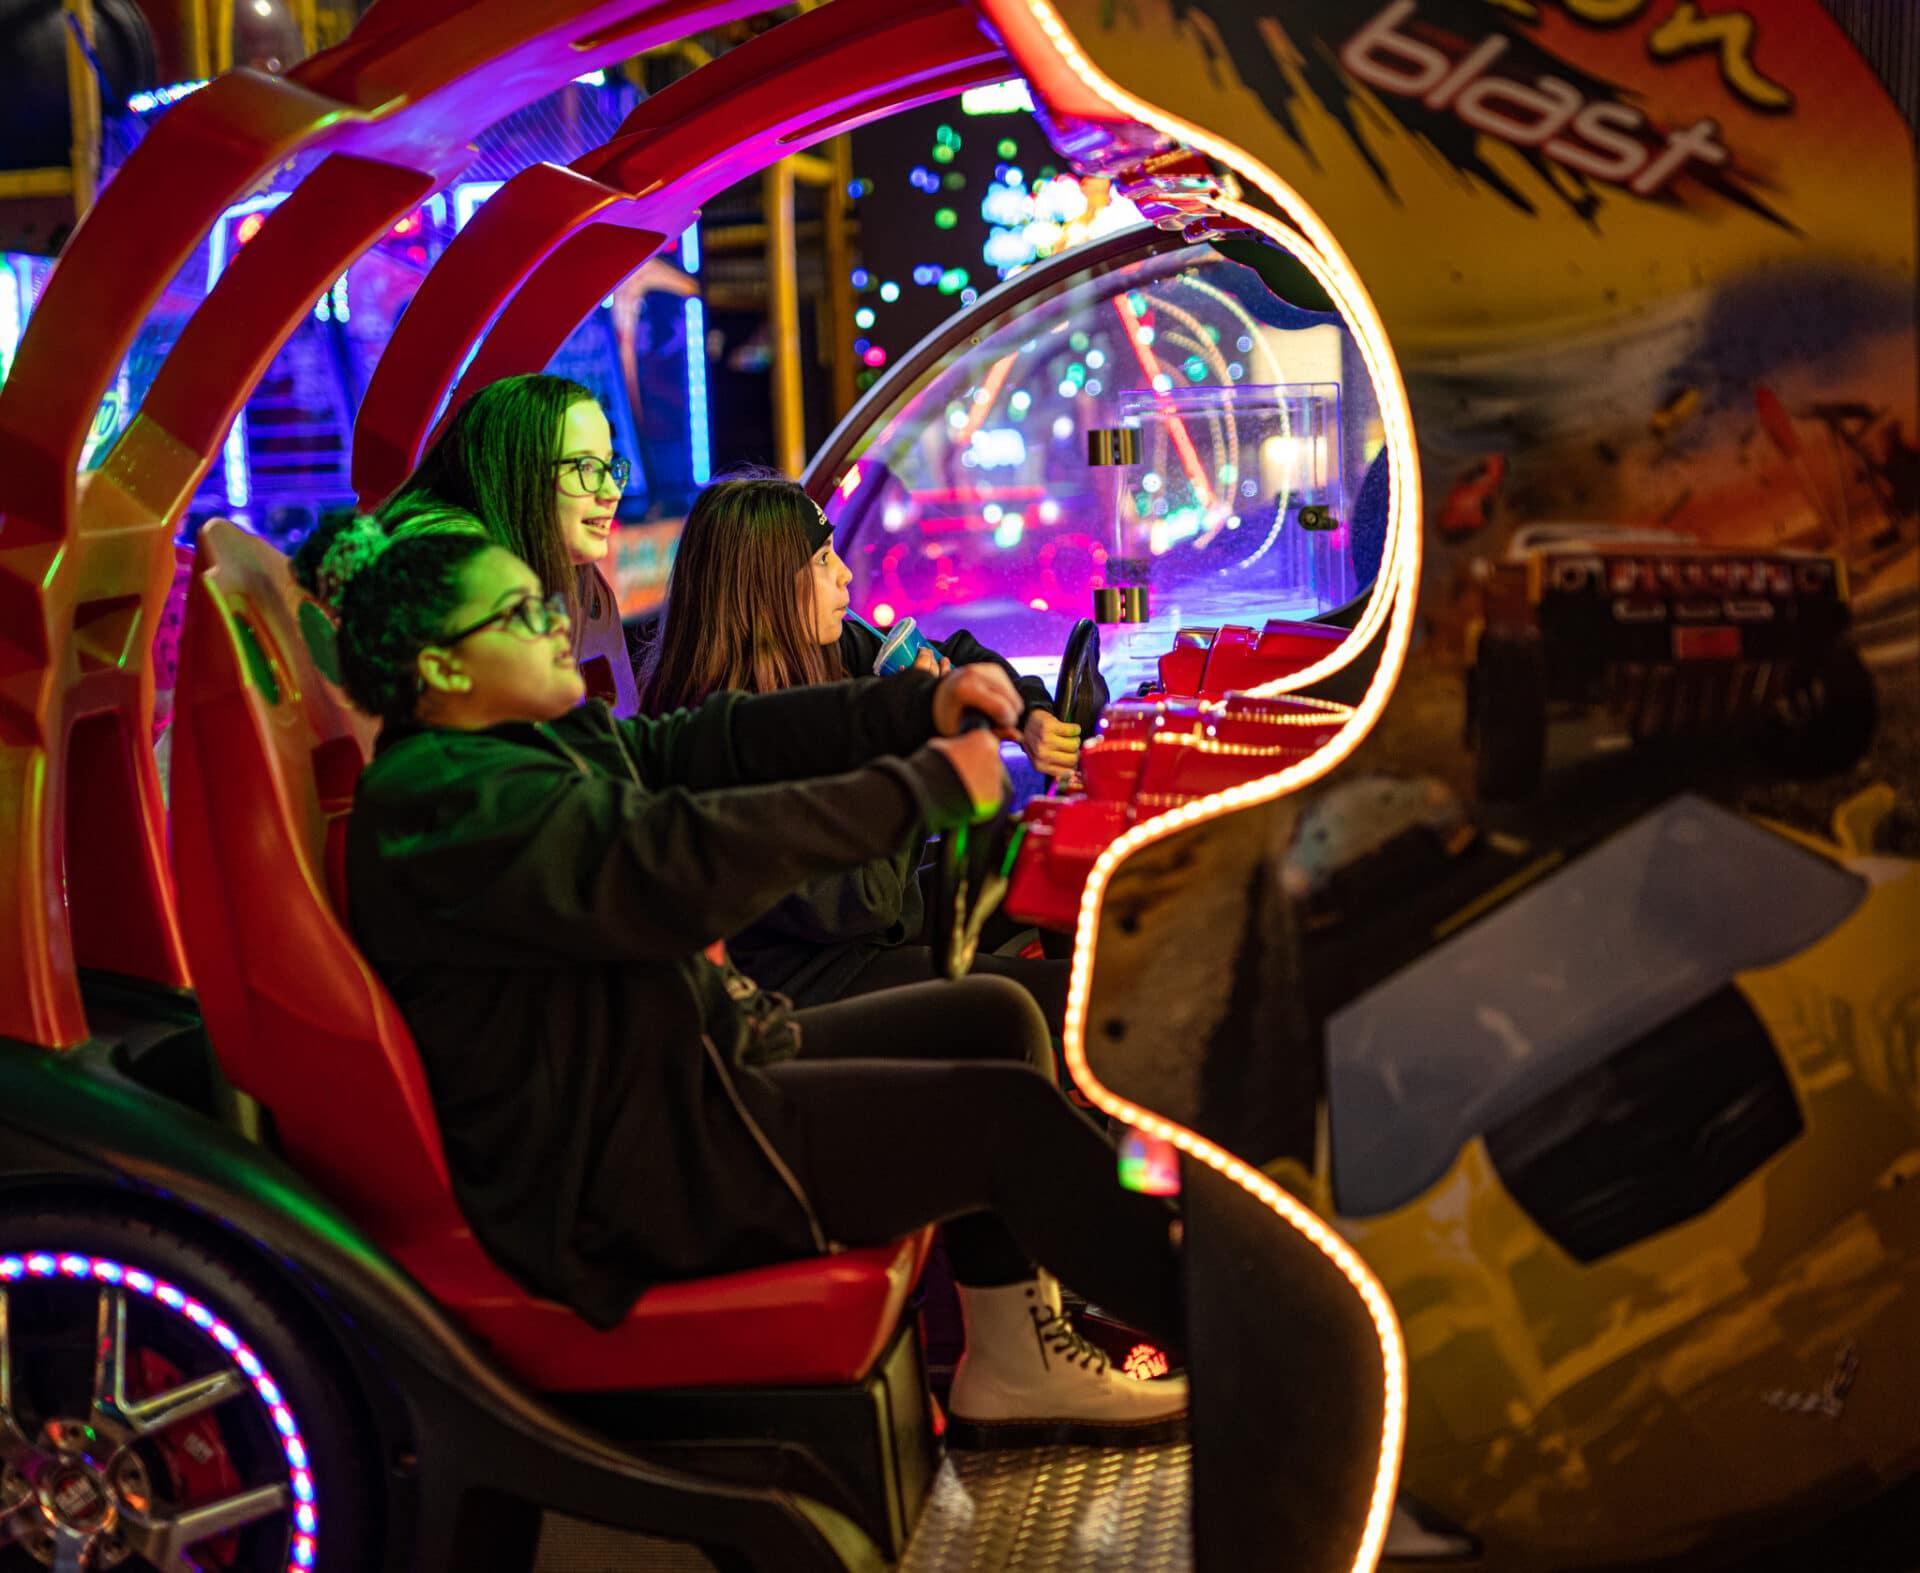 arcade in kenosha, kenosha arcade, america's action territory